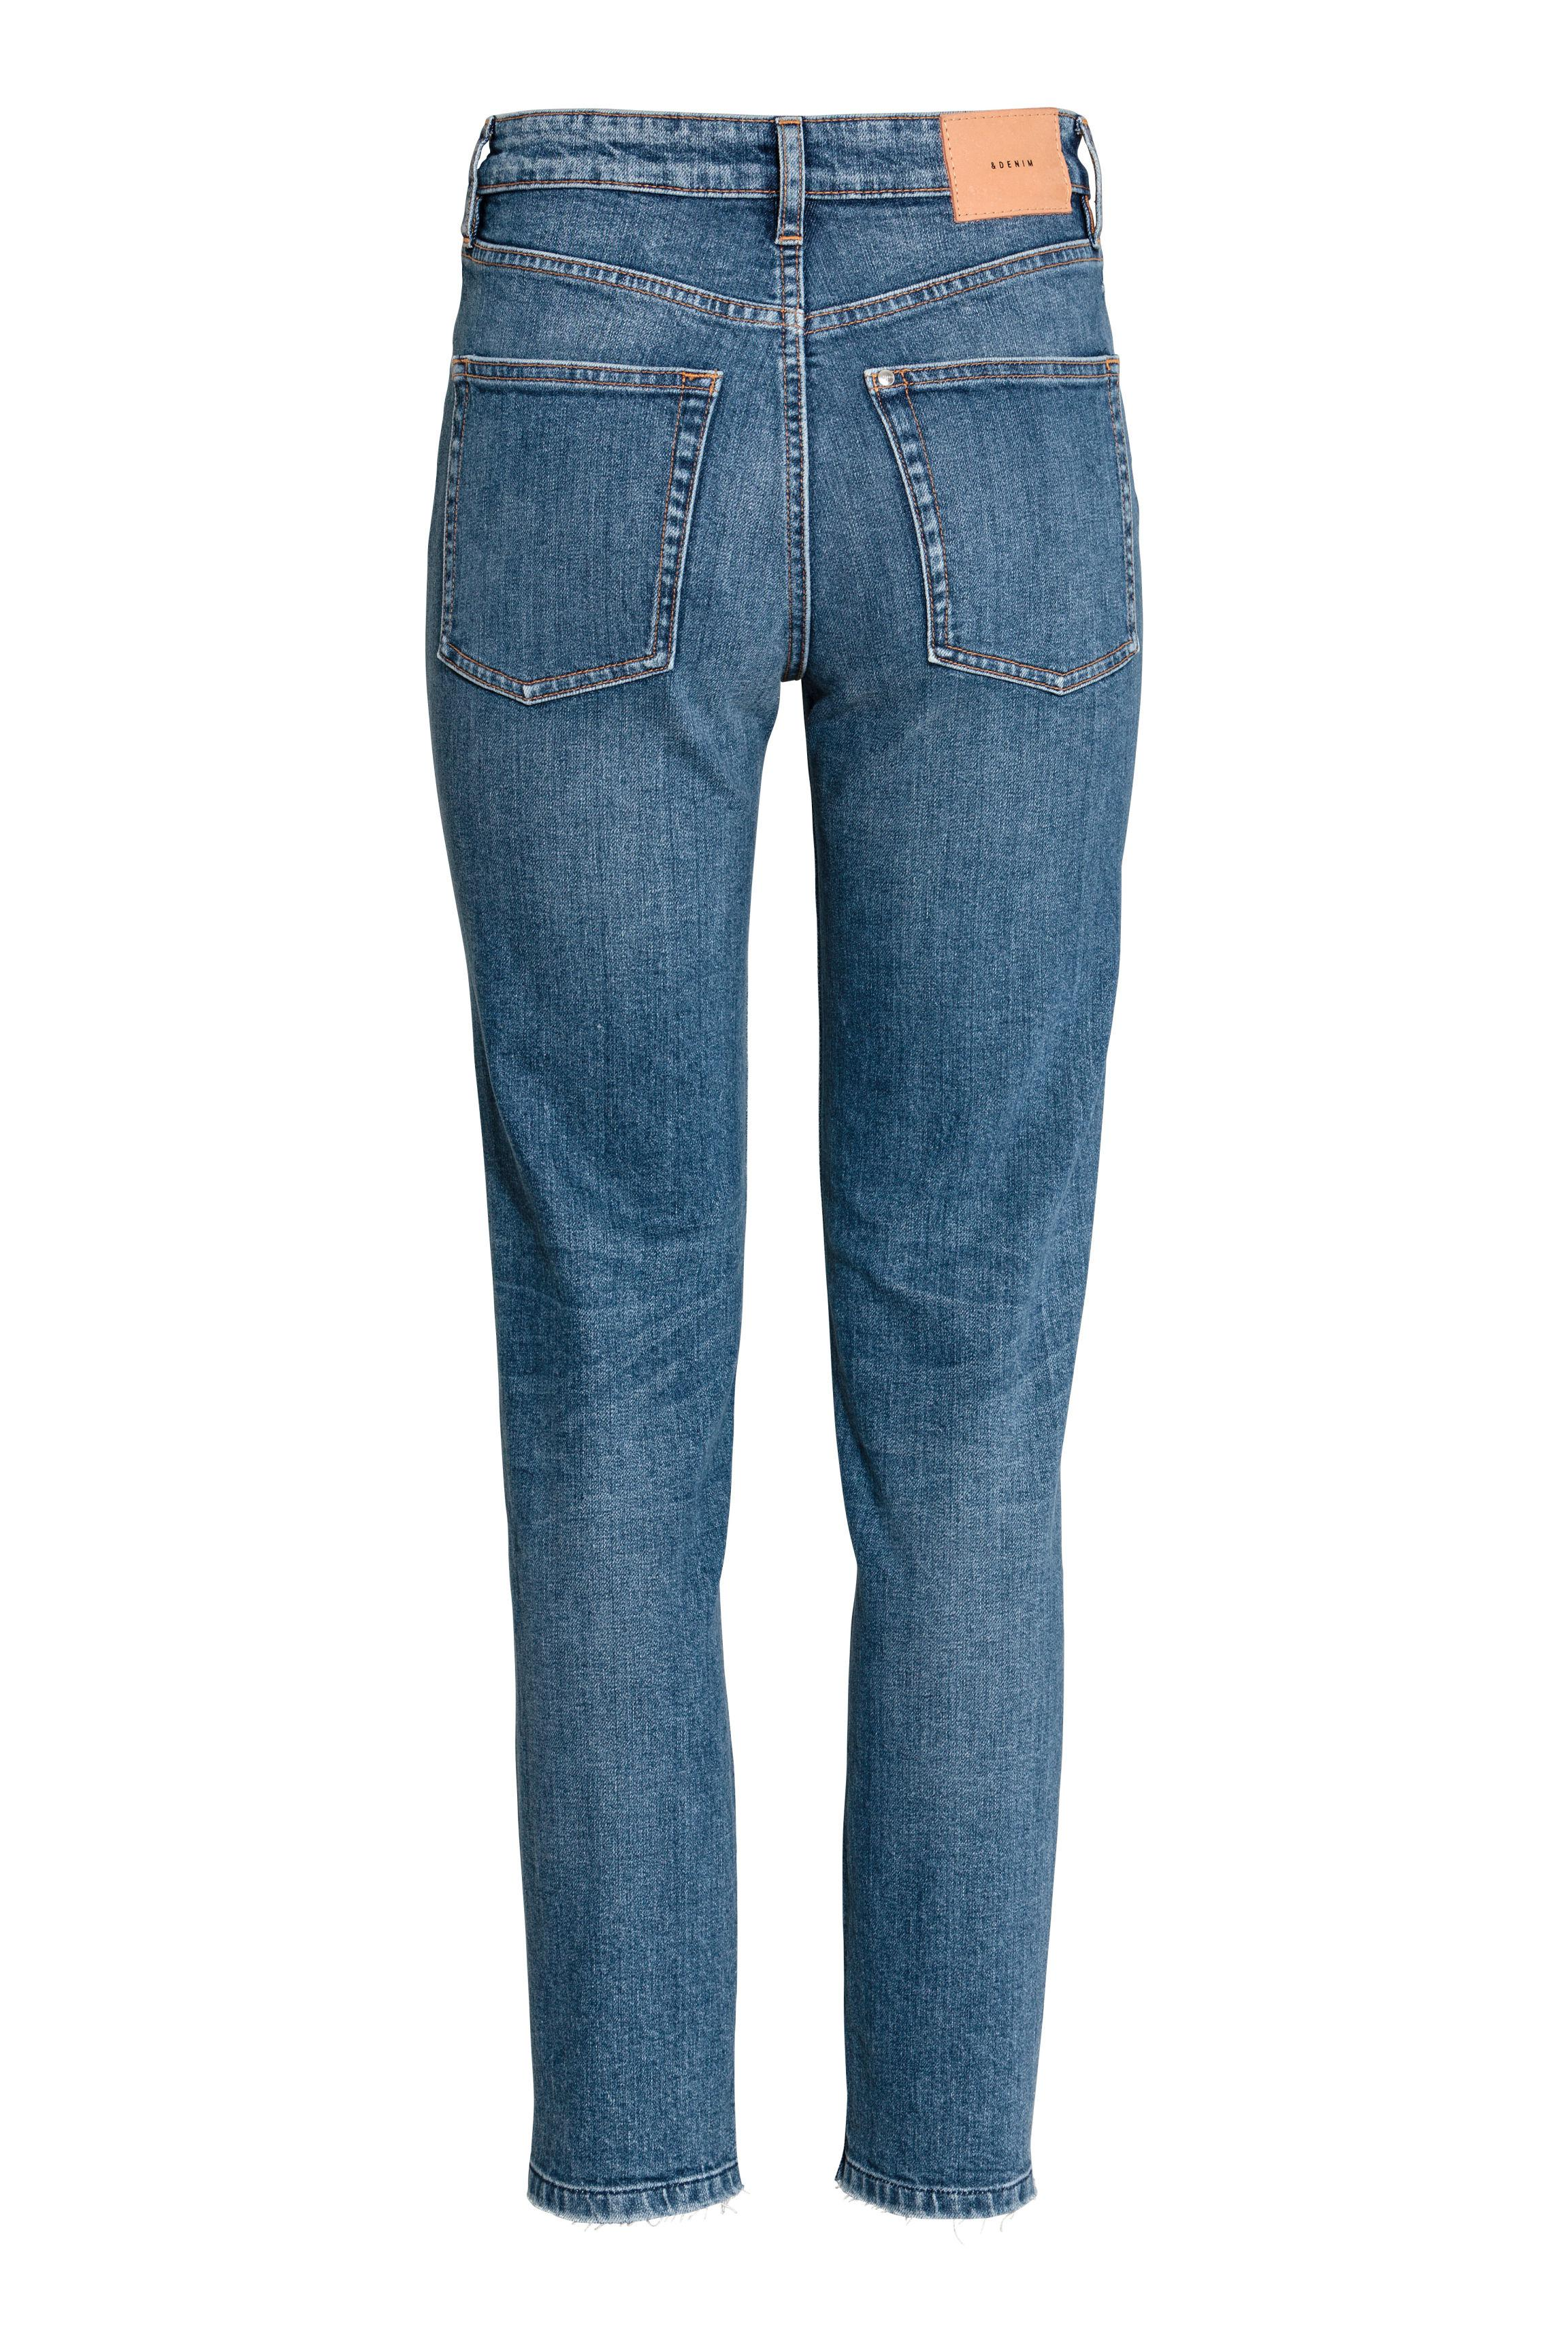 H&M Denim Vintage High Cropped Jeans in Dark Denim Blue (Blue)